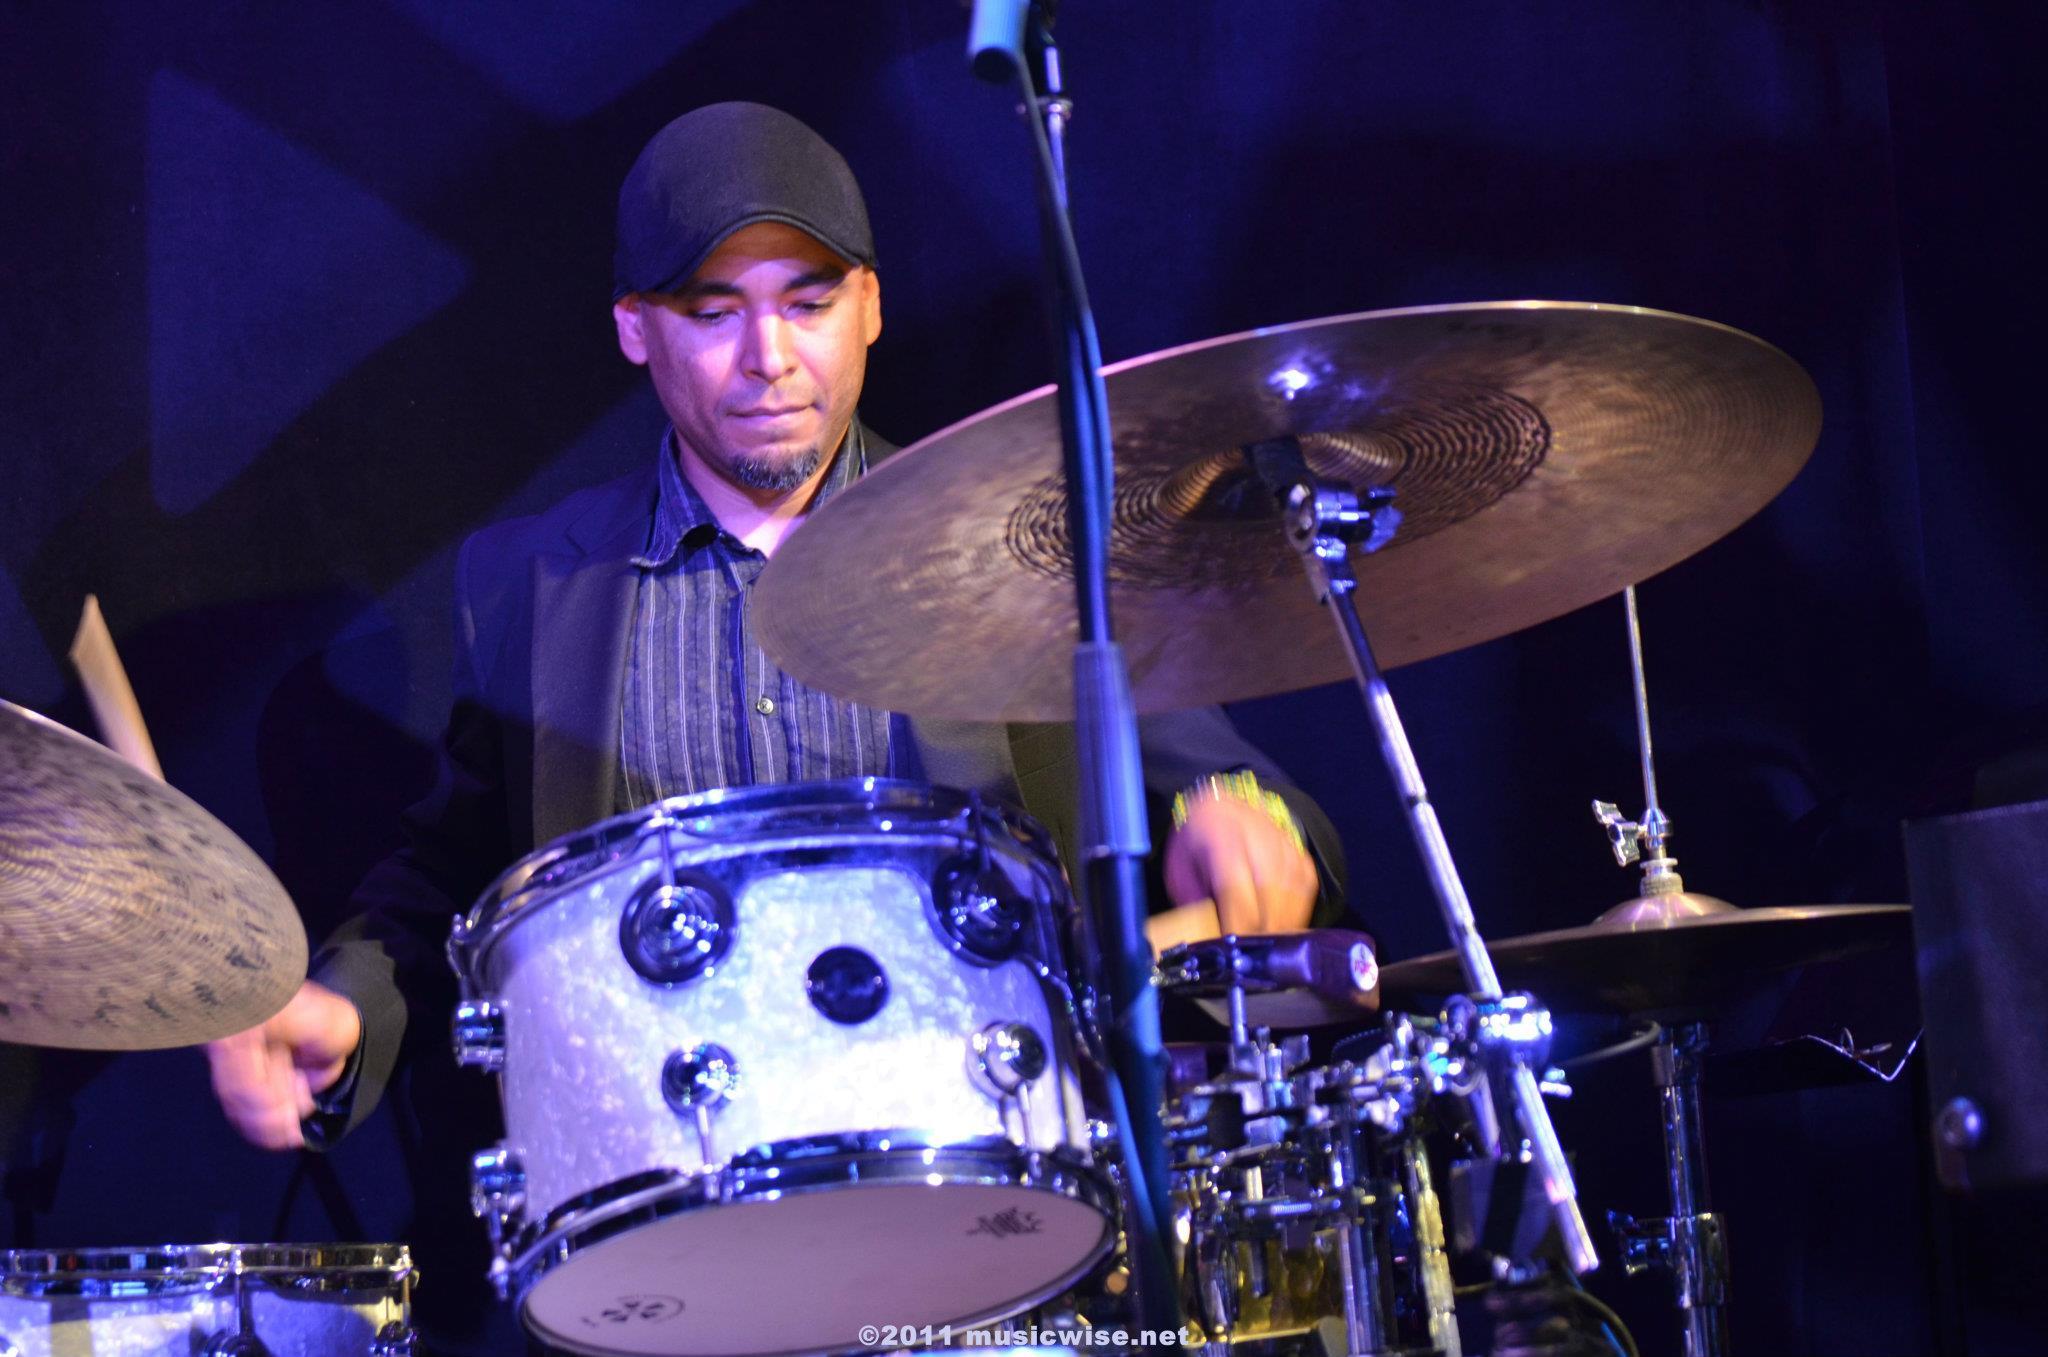 Mauricio Herrera Music - Afro-Cuban Drummer/Percussionist/Performer/Educator